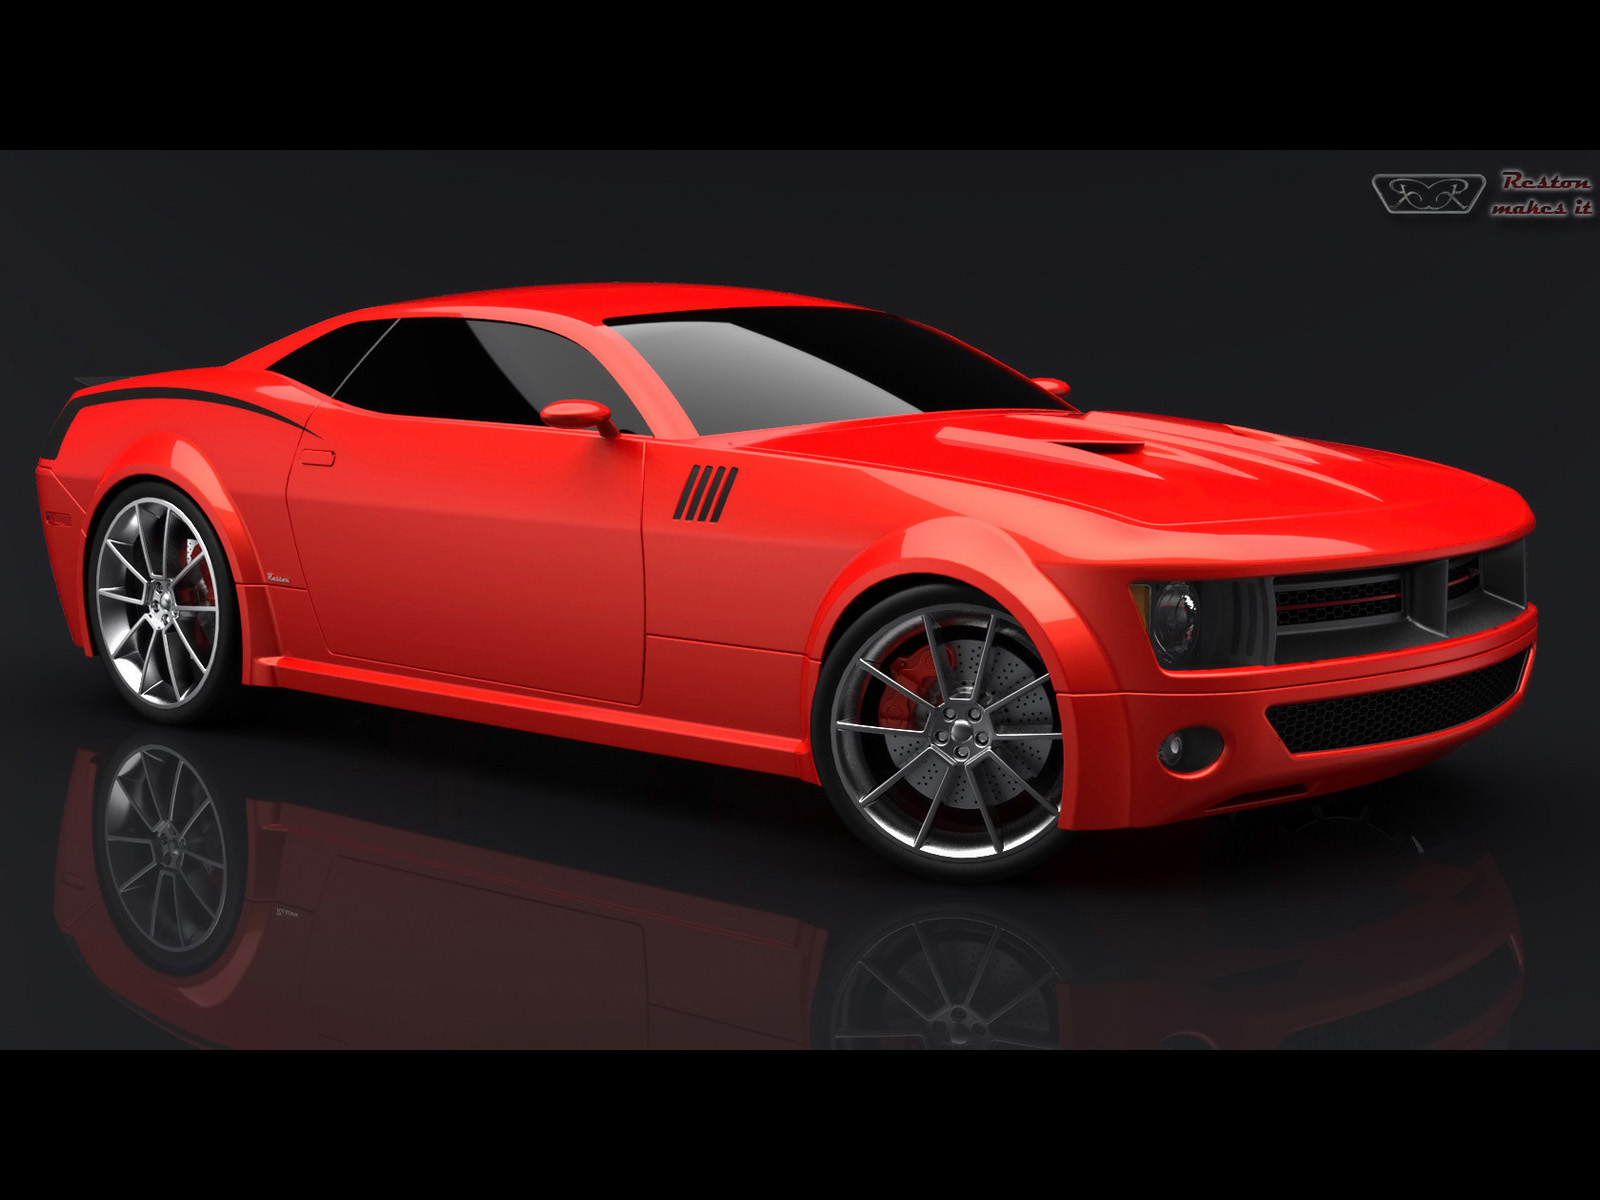 2017 Dodge Barracuda Concept >> Plymouth Cuda photos - PhotoGallery with 19 pics| CarsBase.com